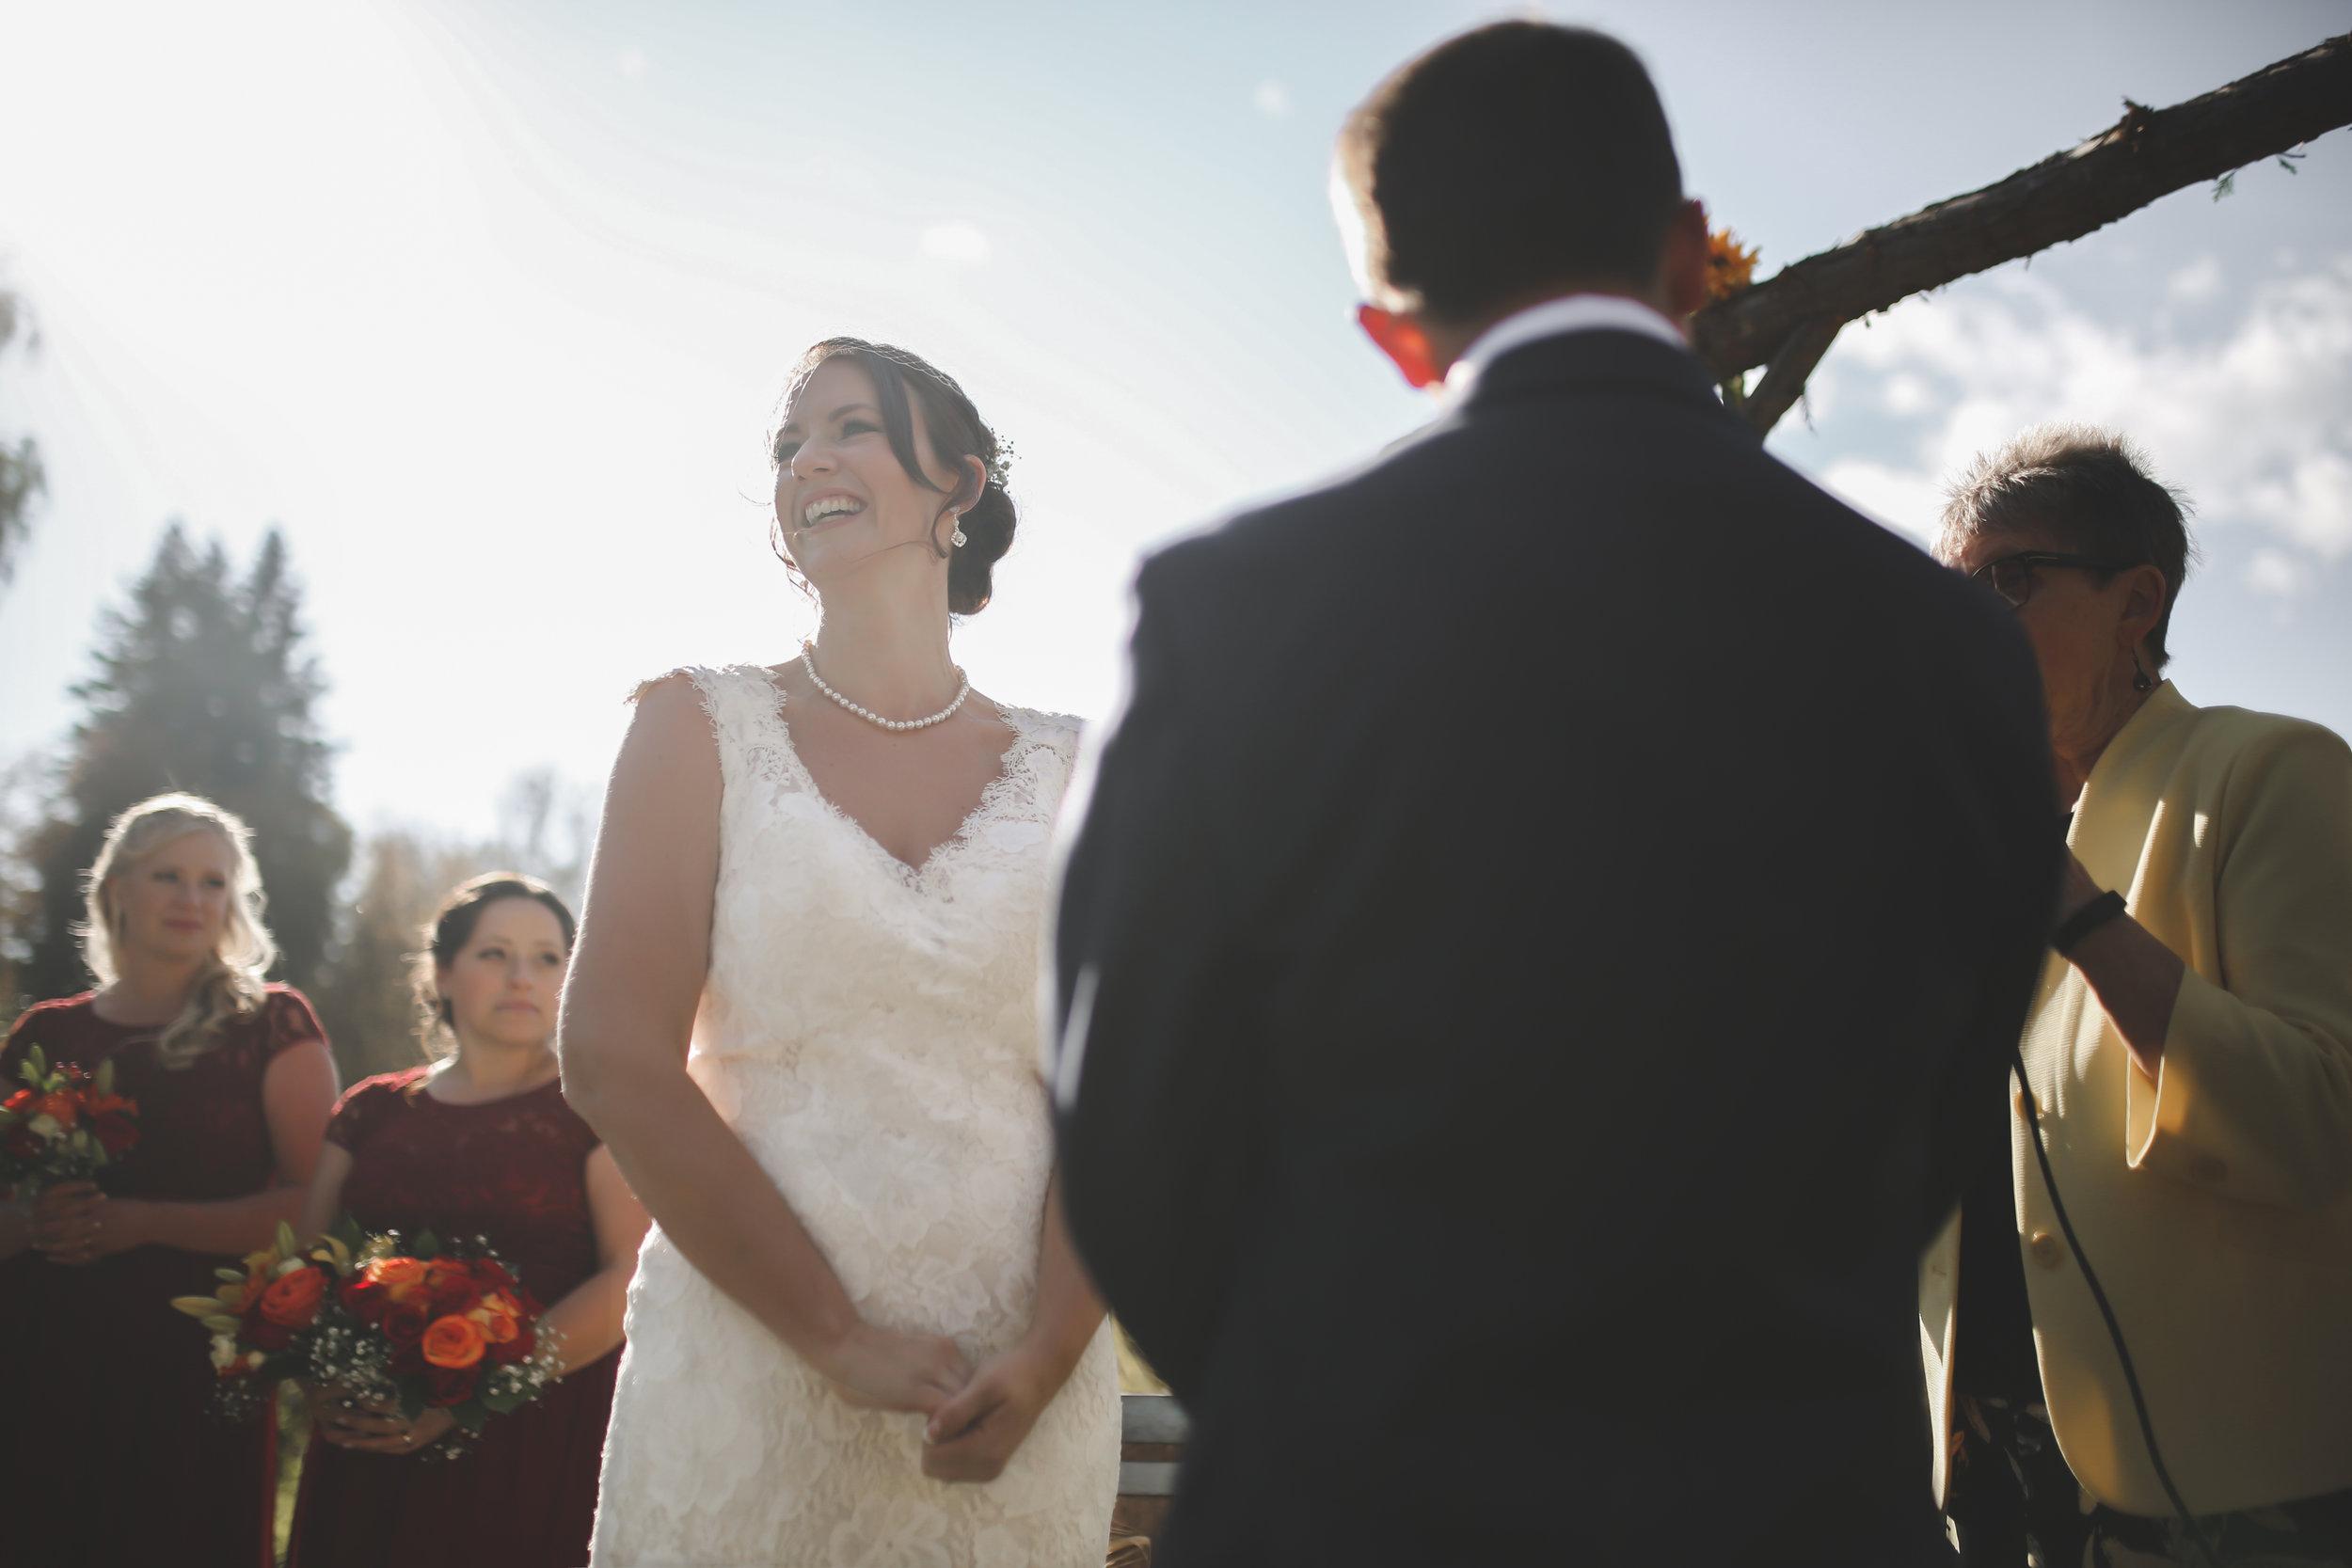 Adam-Ziorio-Photography-Victoria-BC-Weddings-Elopements.jpg